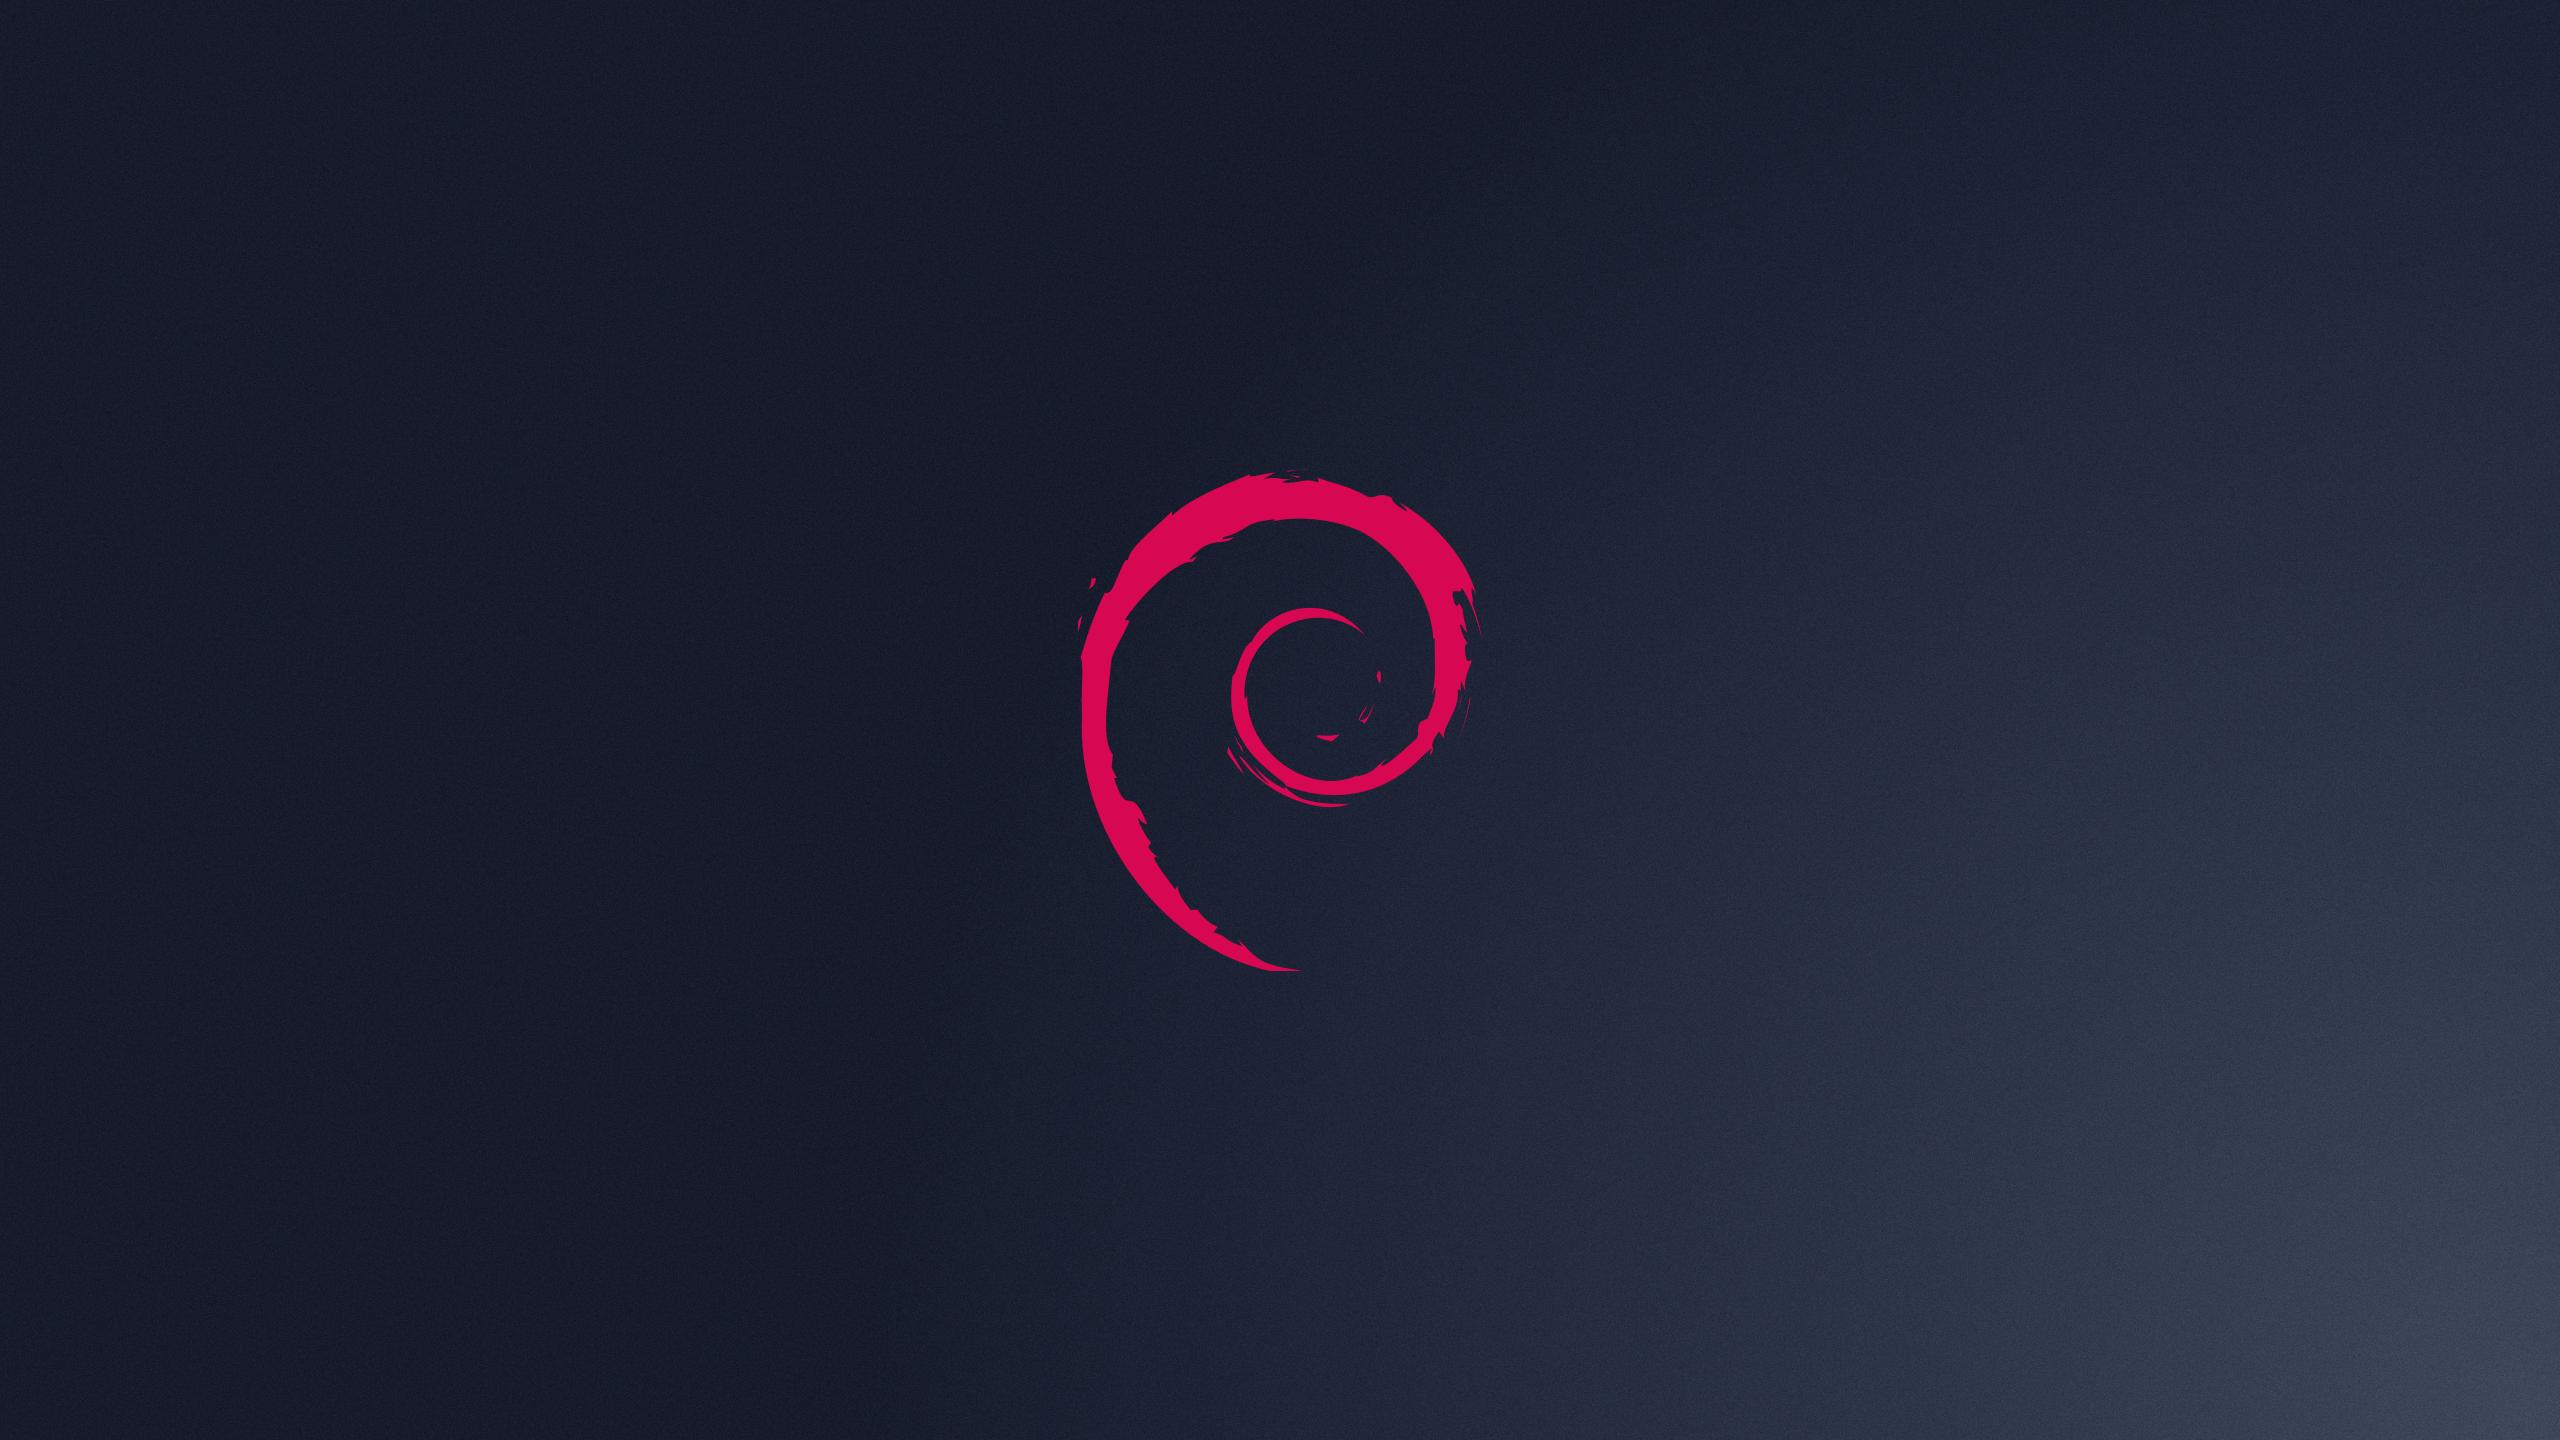 74] Debian Background on WallpaperSafari 2560x1440